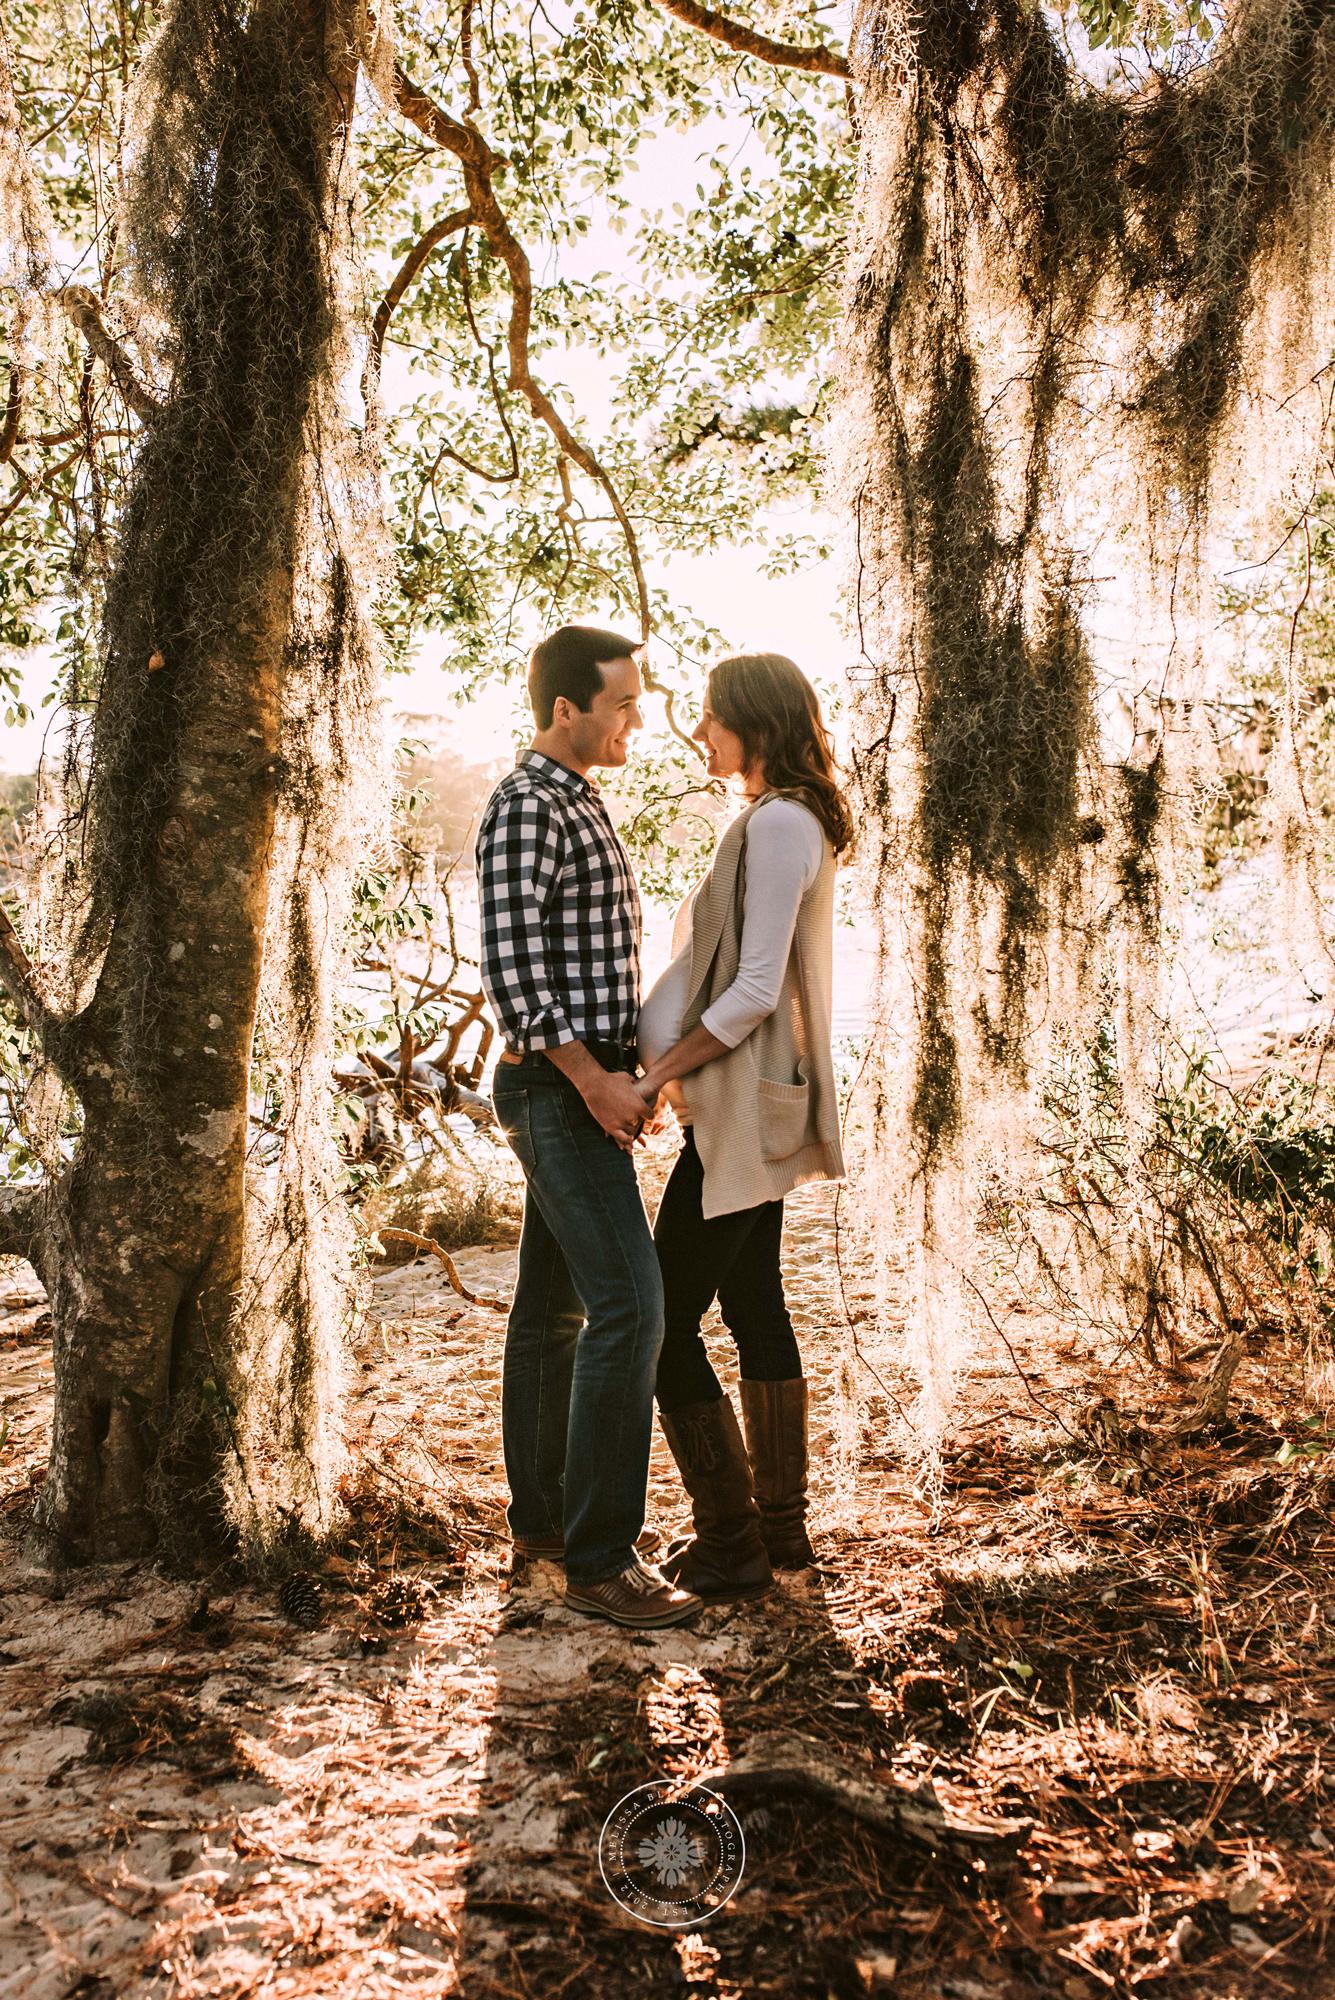 sunlight-streams-through-trees-couples-session-first-landing-state-park-virginia-beach-va-photographer